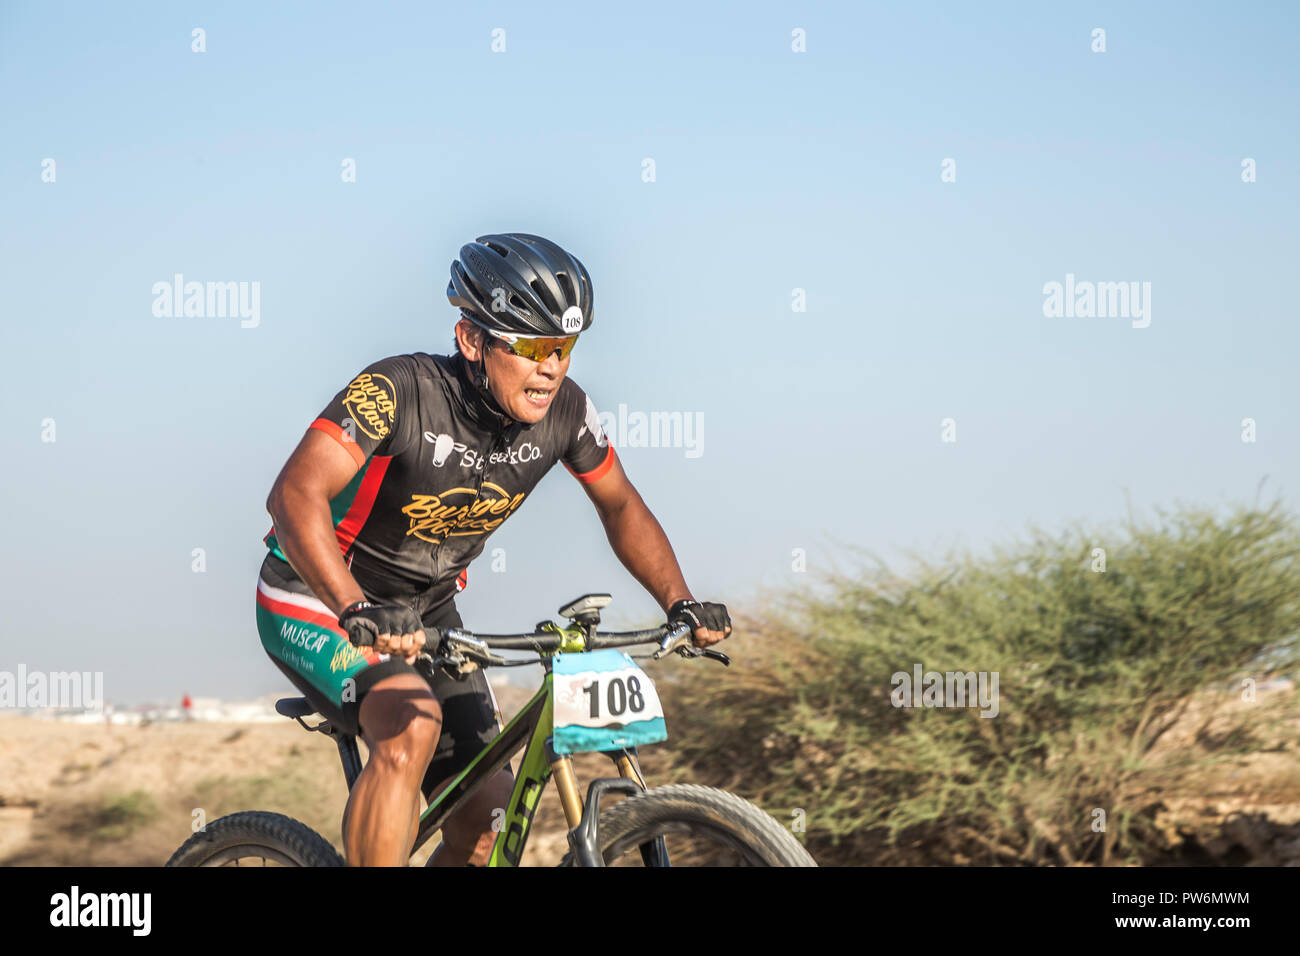 Mountain Bike  Race, Cross country. Muscat, Oman - Stock Image